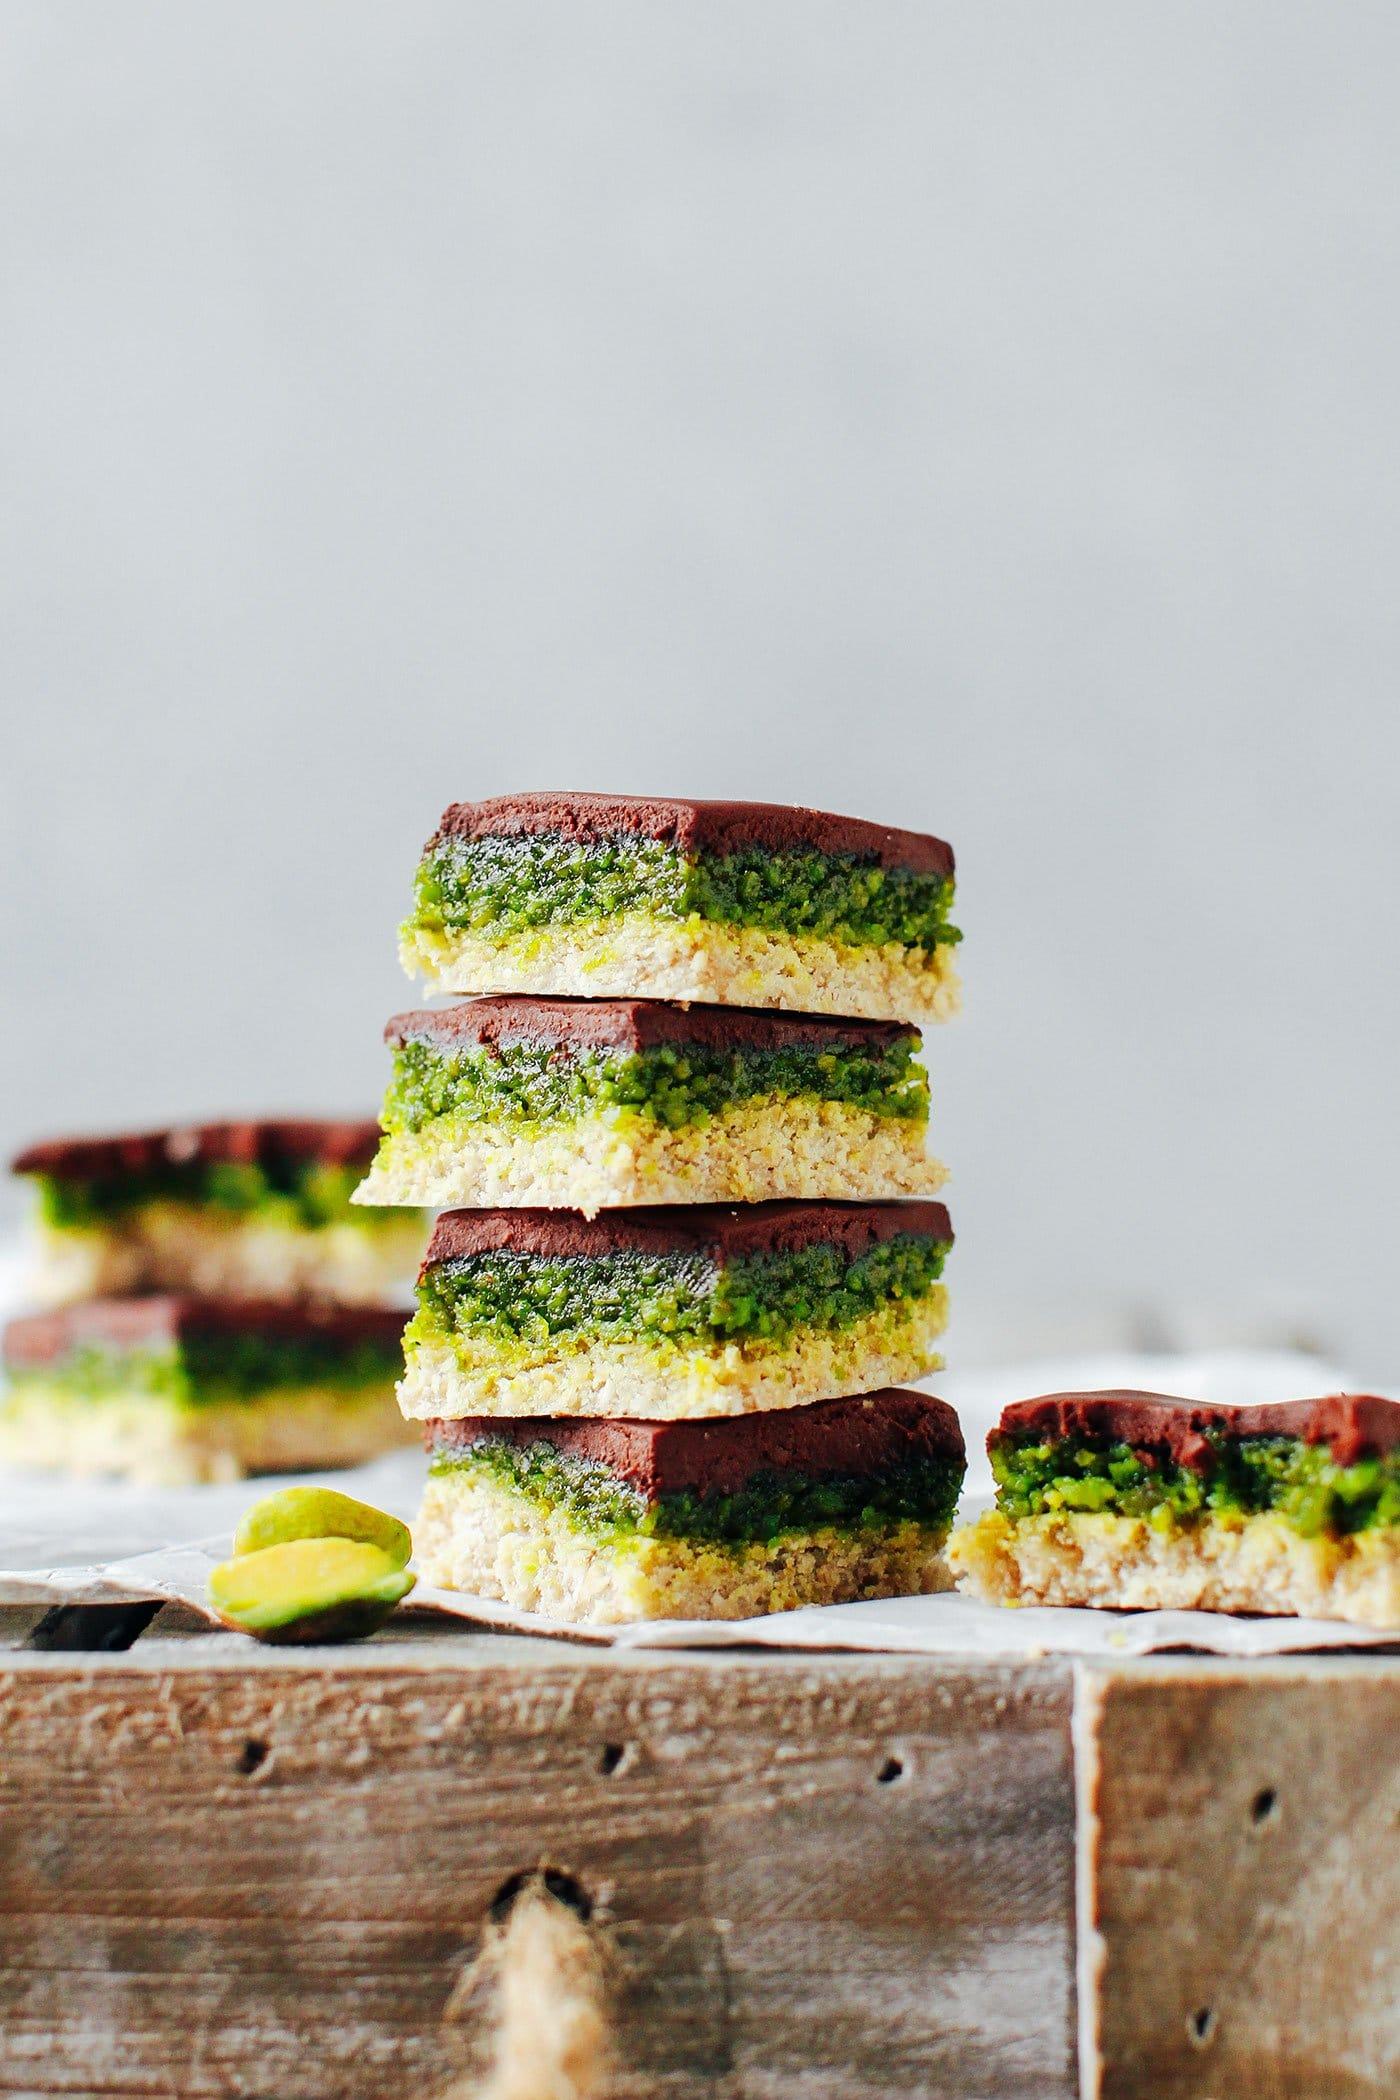 No-Bake Chocolate Pistachio Bars (Vegan + GF)